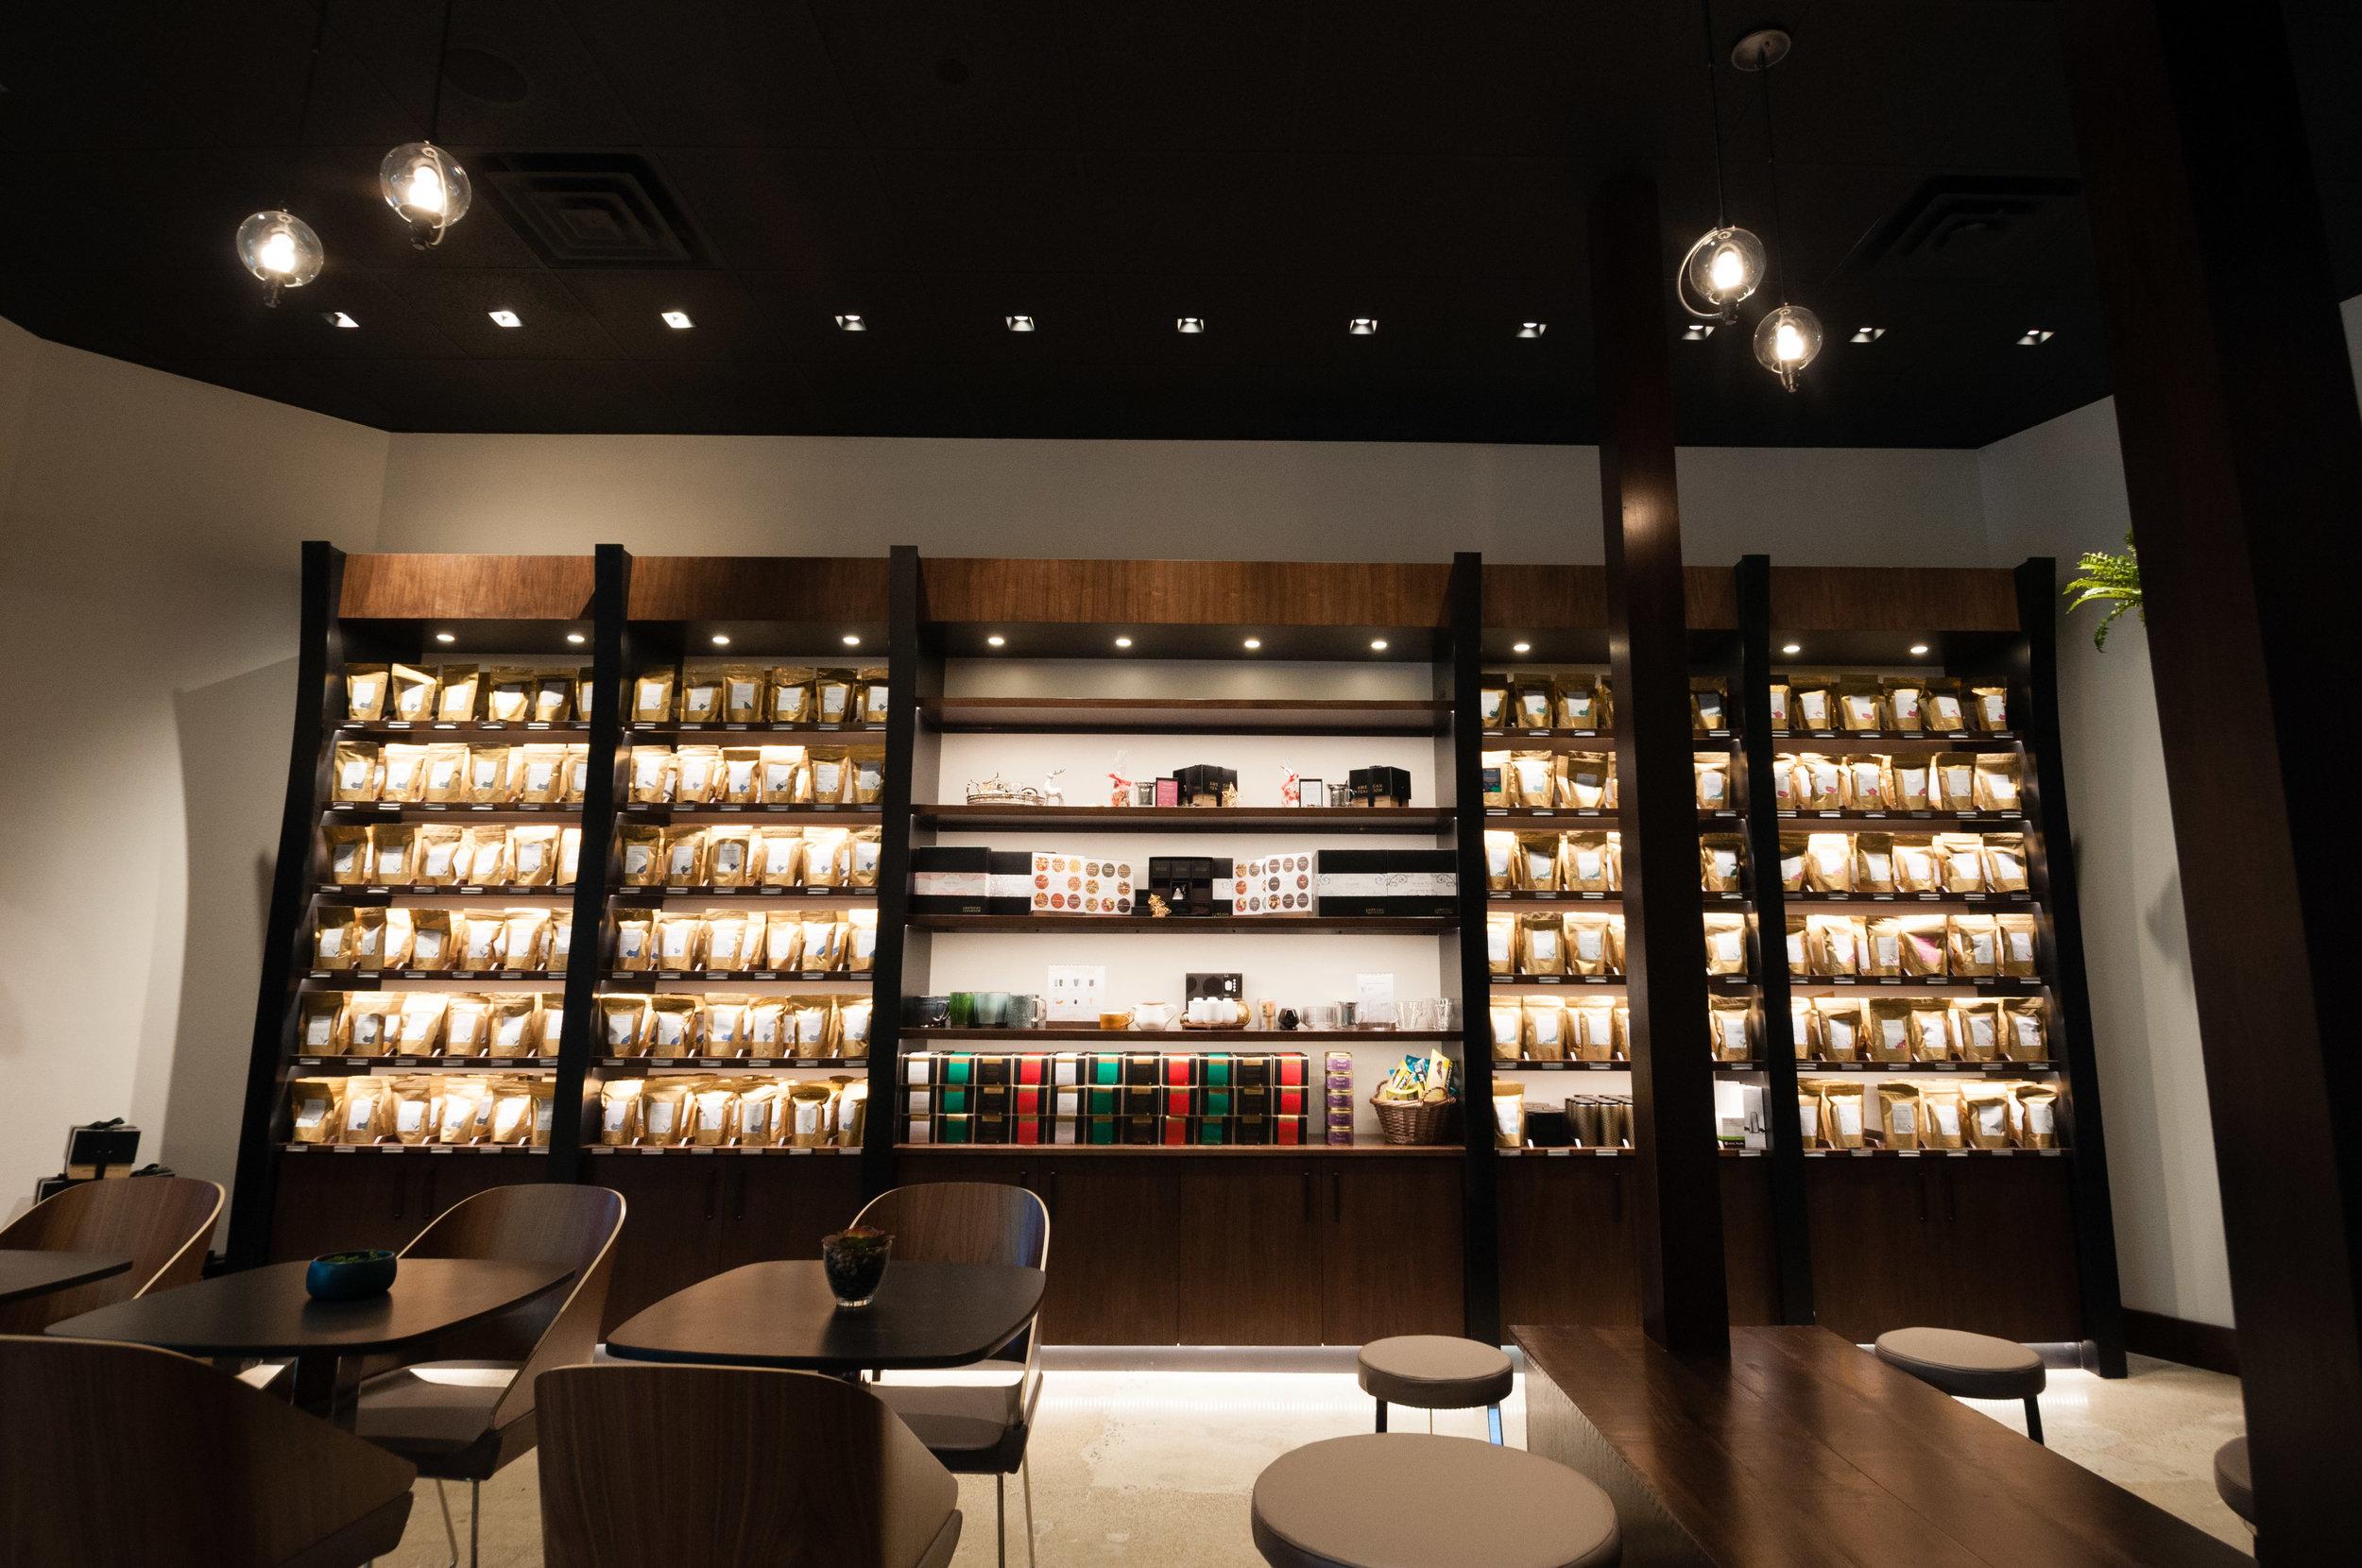 American Tea Roomcosta mesa -